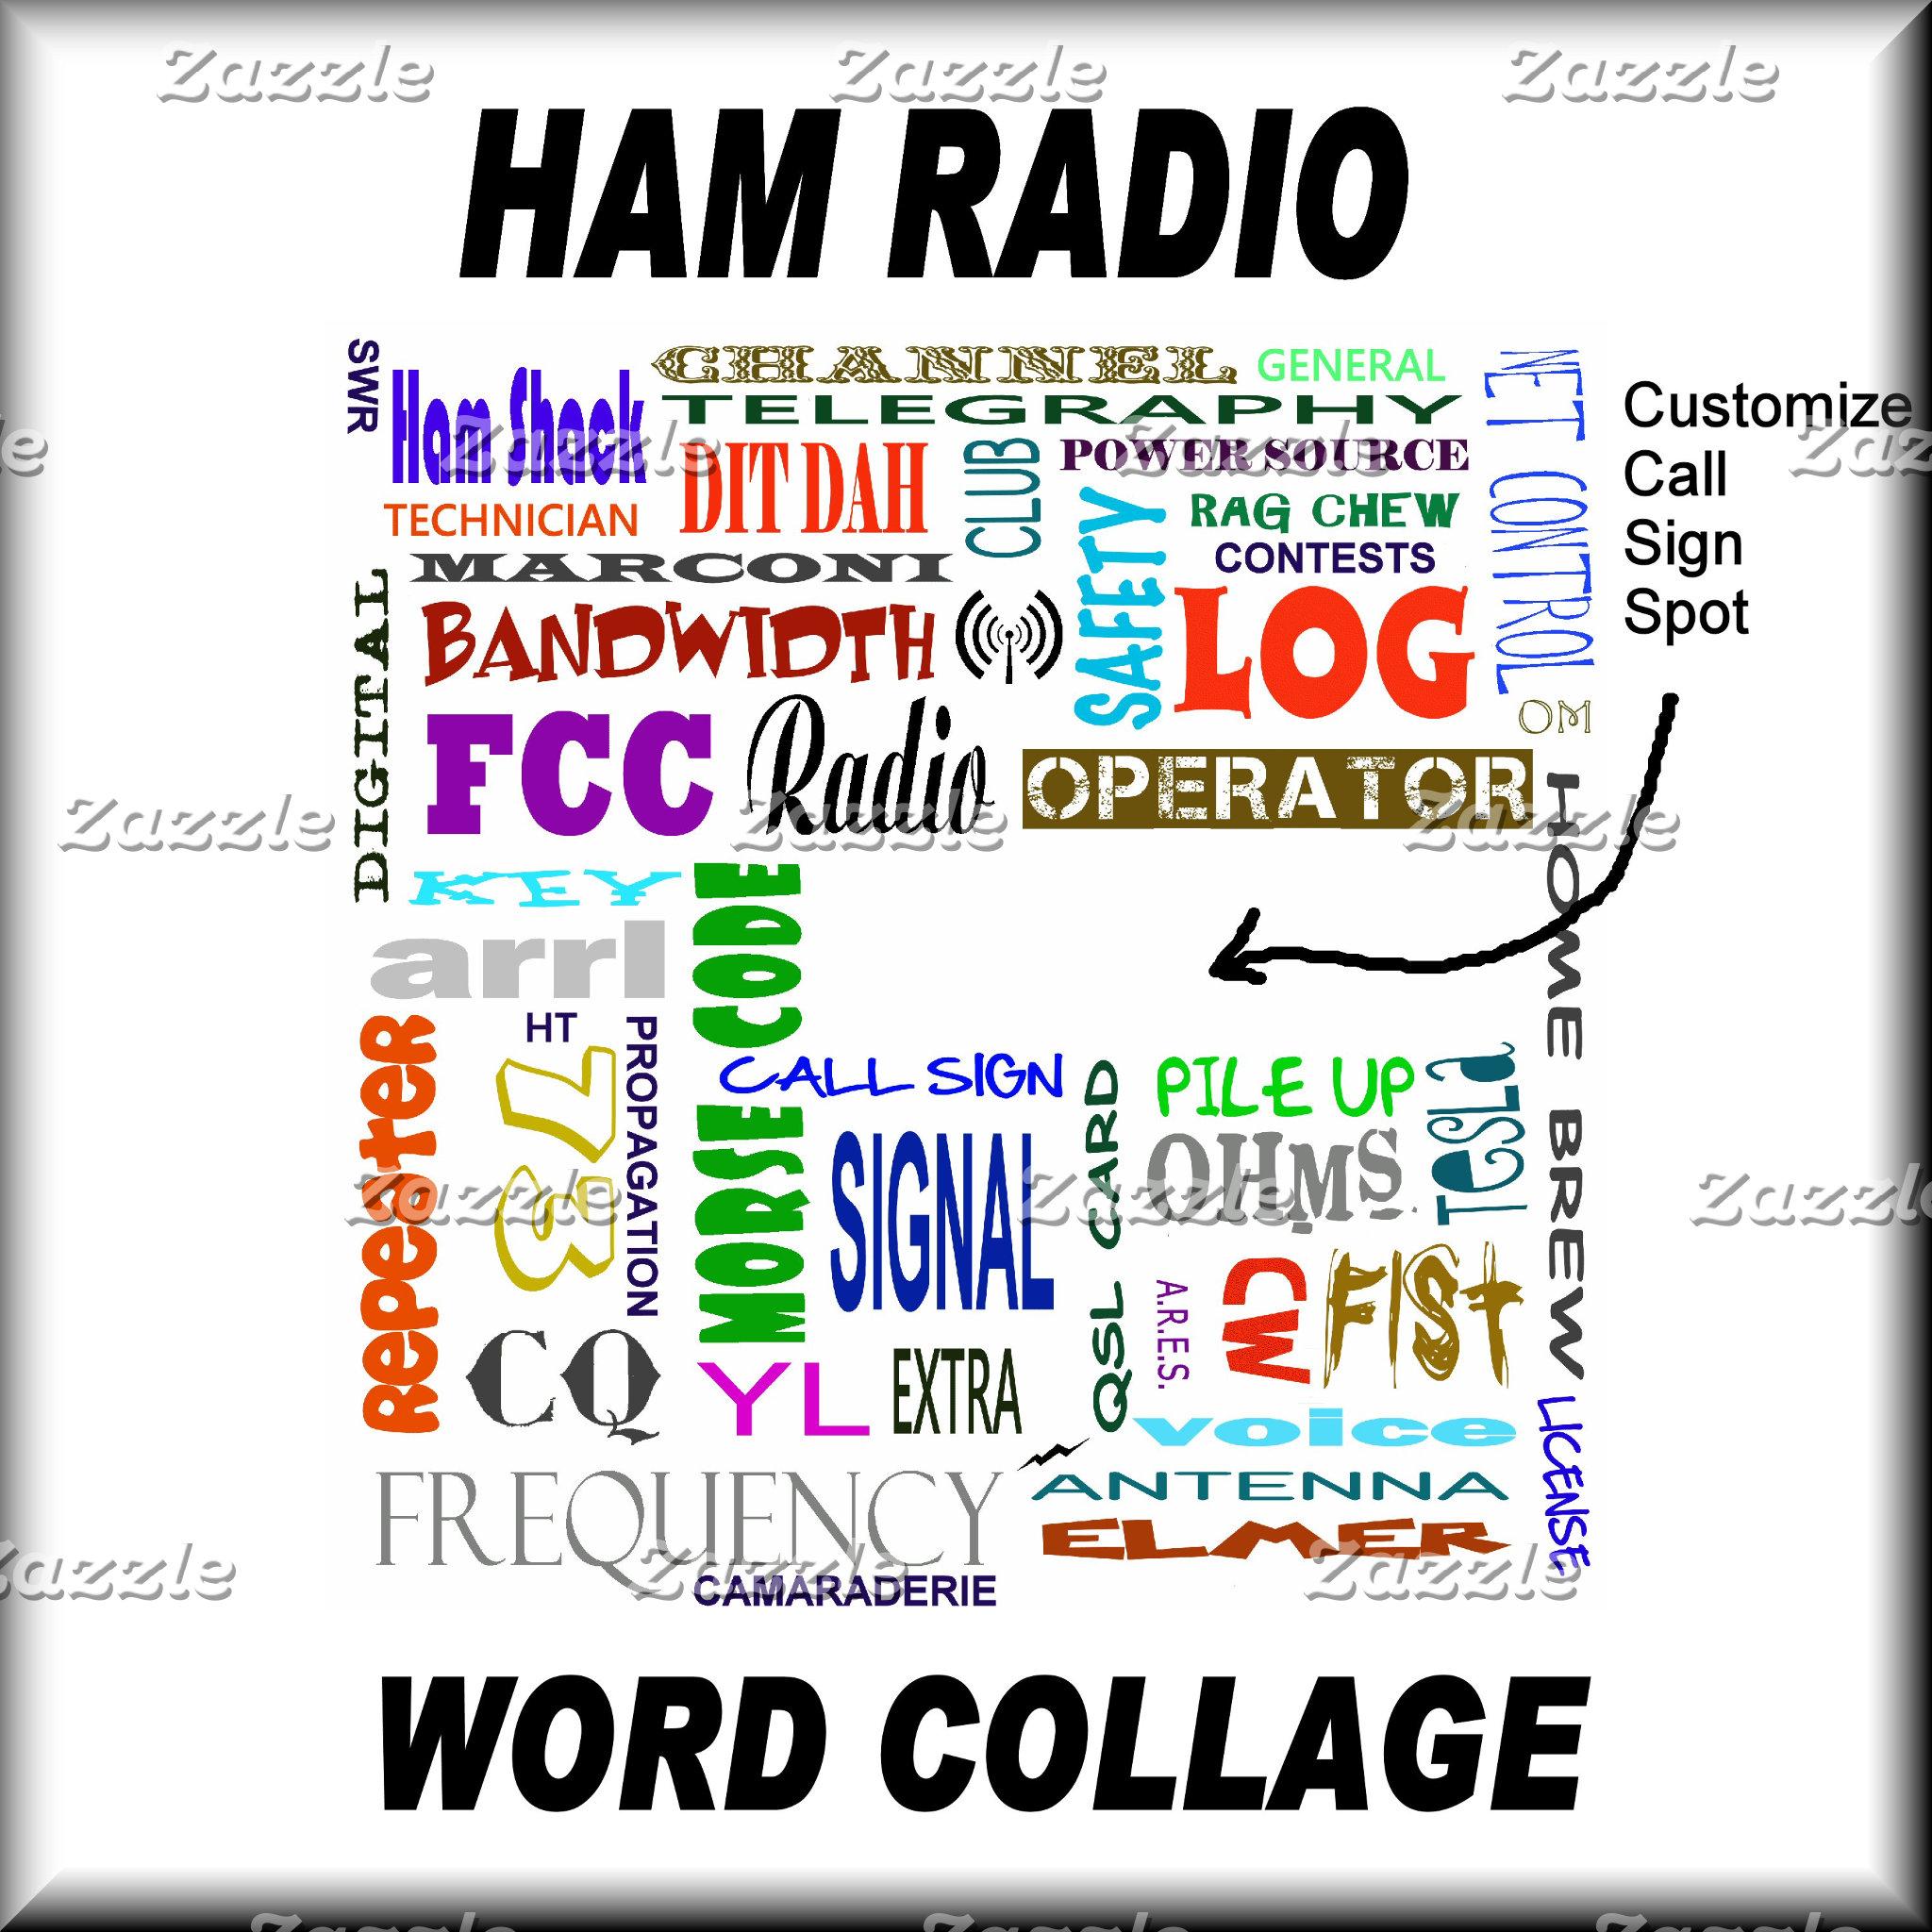 HAM RADIO WORD COLLAGE